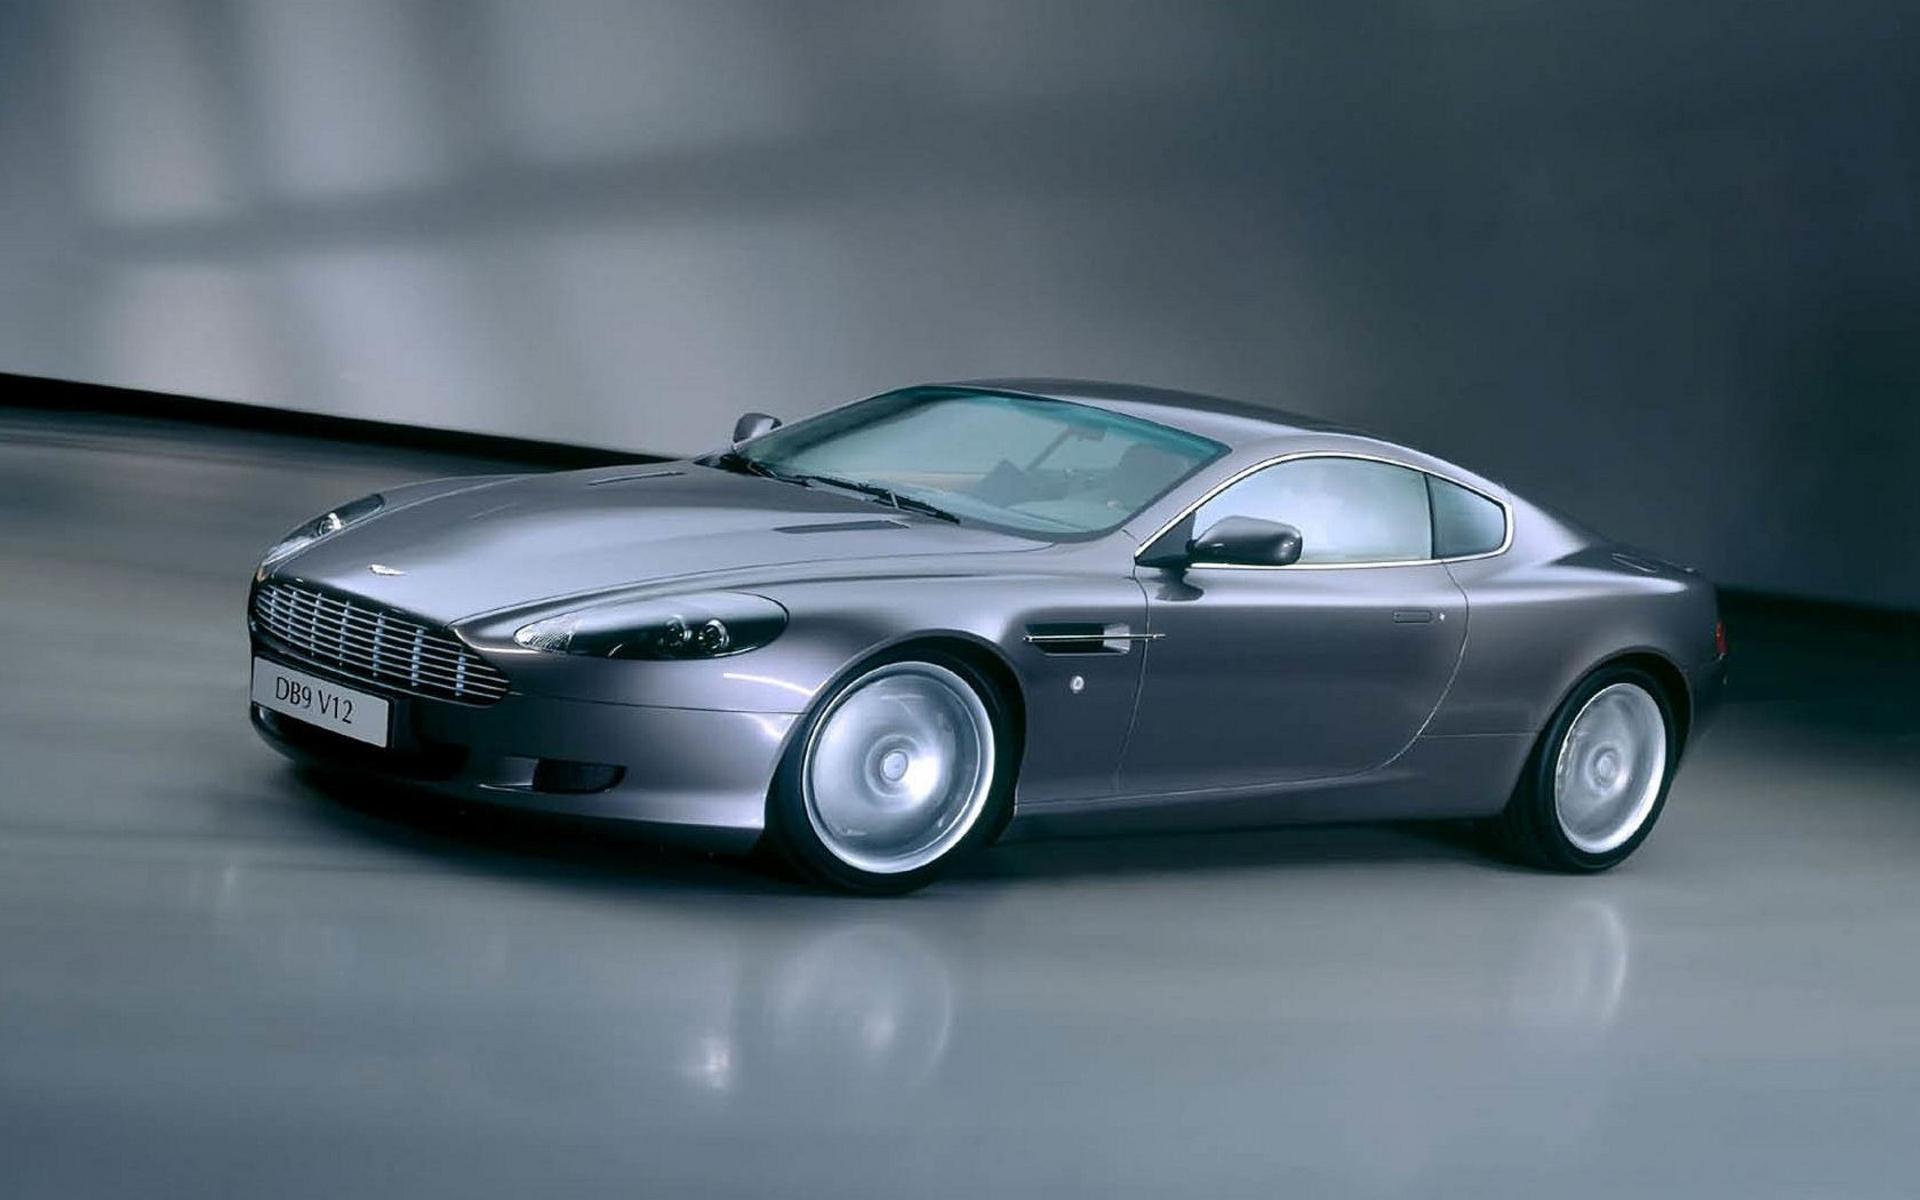 Aston Martin DB9 wallpaper 9128 1920x1200